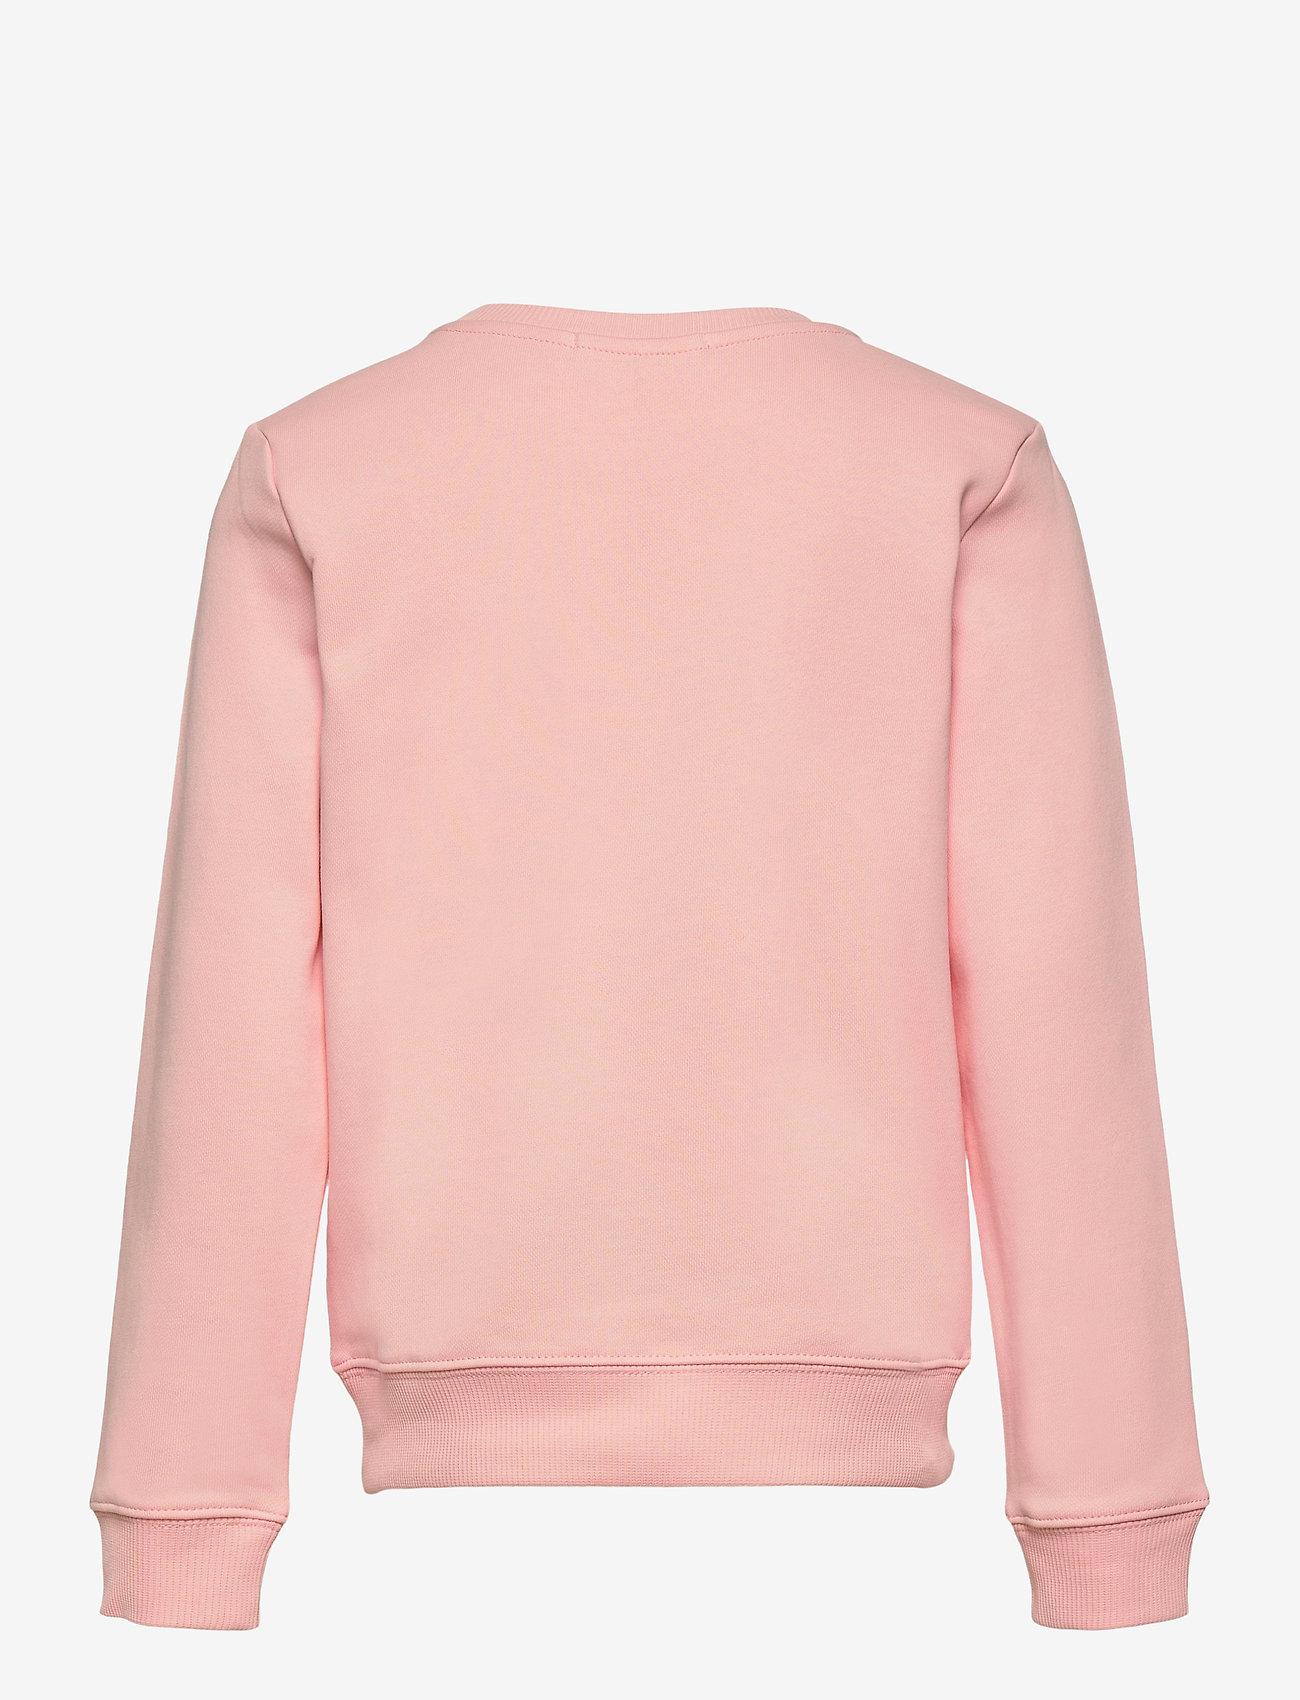 Calvin Klein - MONOGRAM LOGO SWEATSHIRT - sweatshirts - sand rose - 1